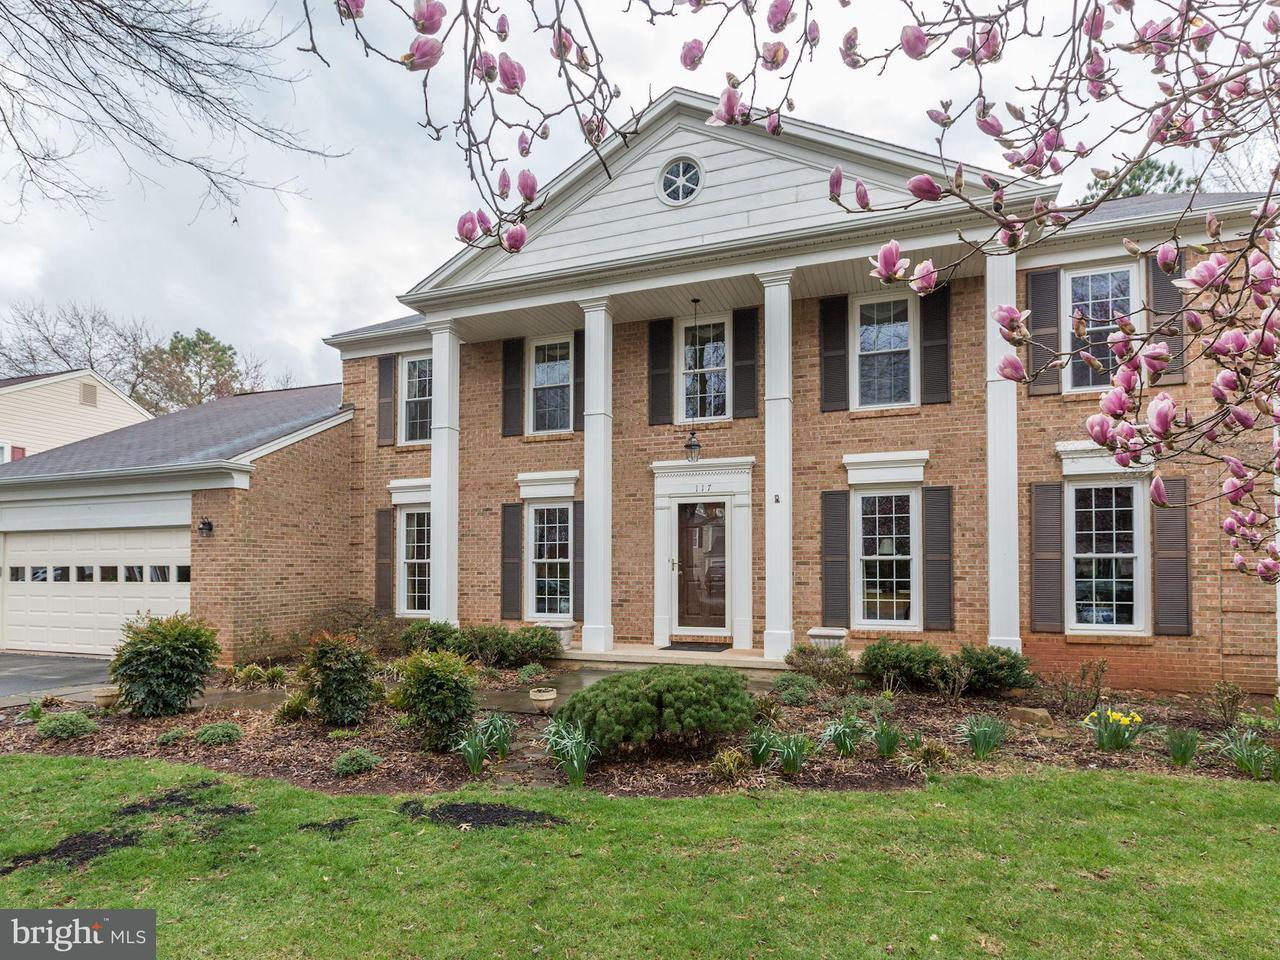 獨棟家庭住宅 為 出售 在 117 Hamilton Road 117 Hamilton Road Potomac Falls, 弗吉尼亞州 20165 美國